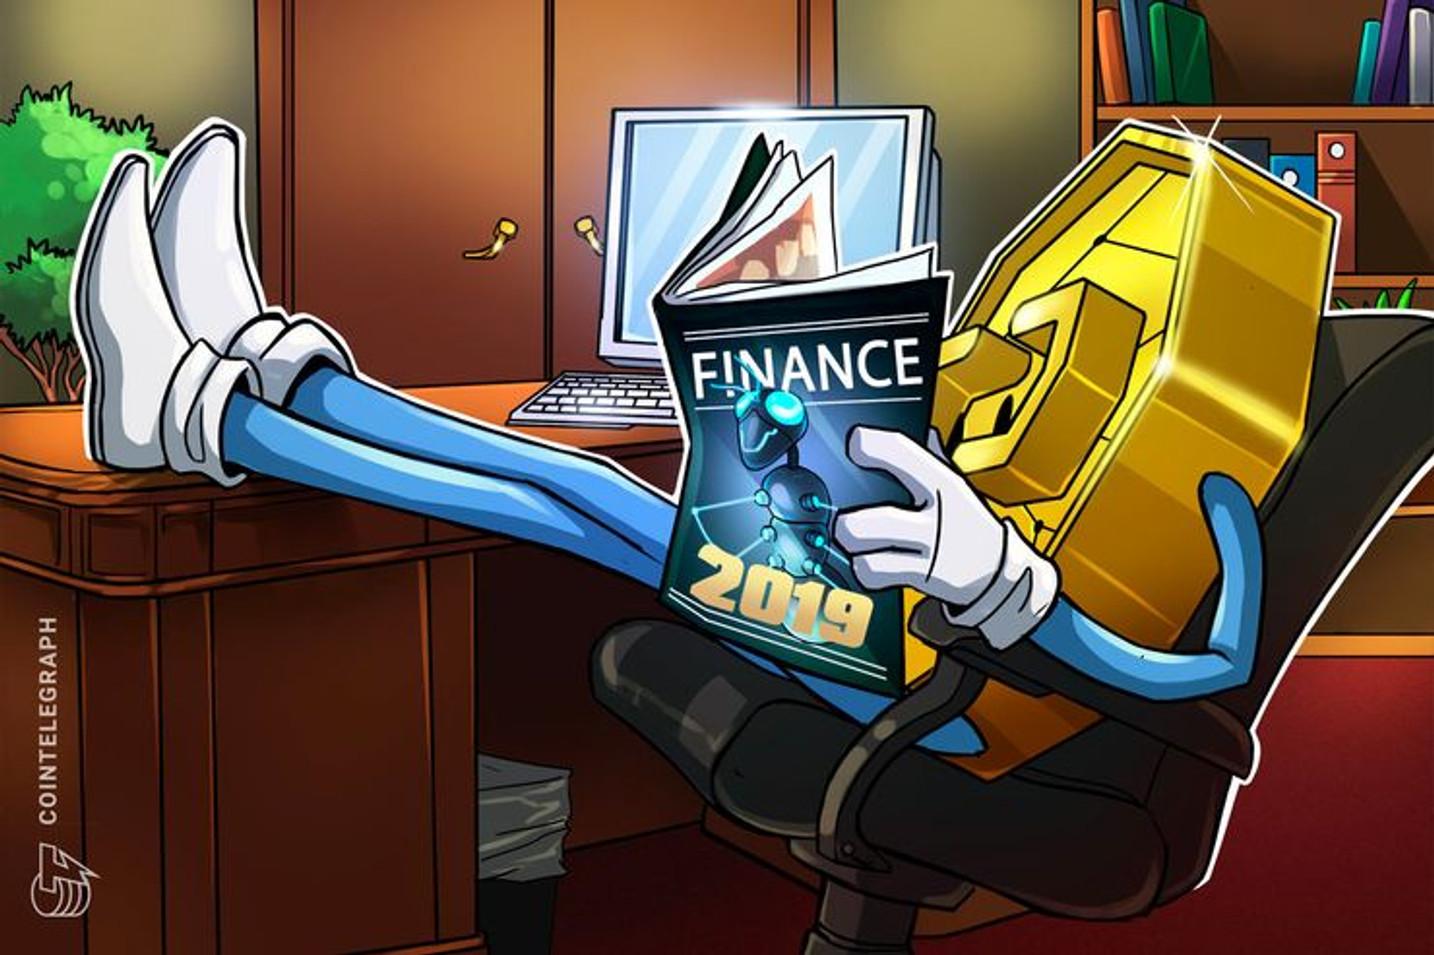 Apesar de crescimento de blockchain, analista diz que Bitcoin vai liderar indústria cripto em 2020